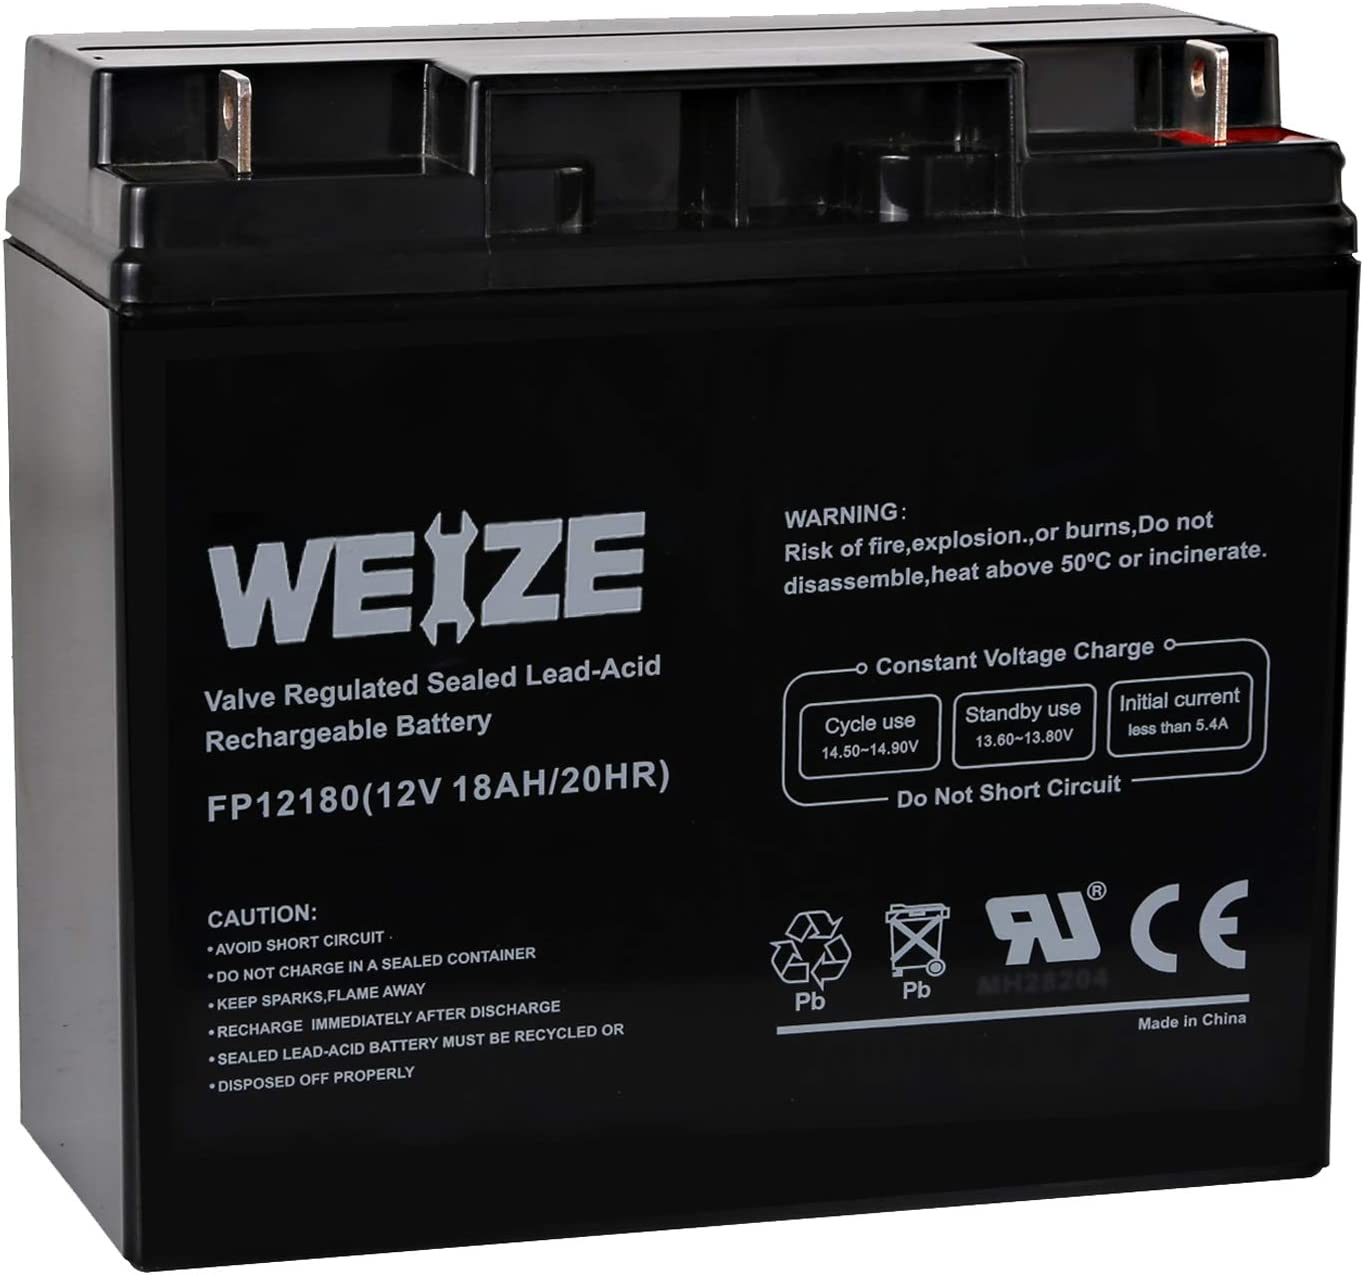 Weize 12V 18AH Battery Sealed Lead Acid Rechargeable SLA AGM Batteries Replaces UB12180 FM12180 6fm18, General Use